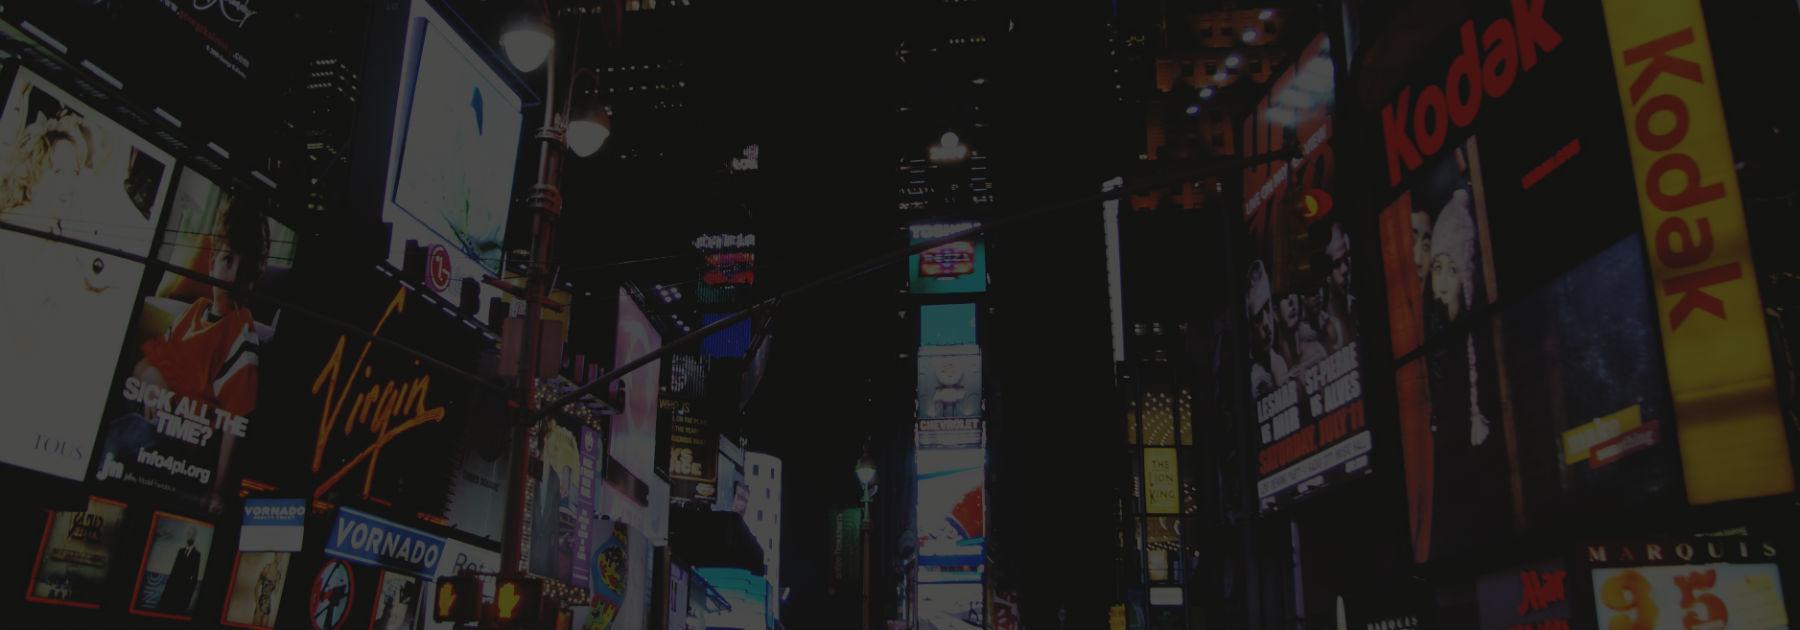 Advertising & SEO - Be Devious Web Development